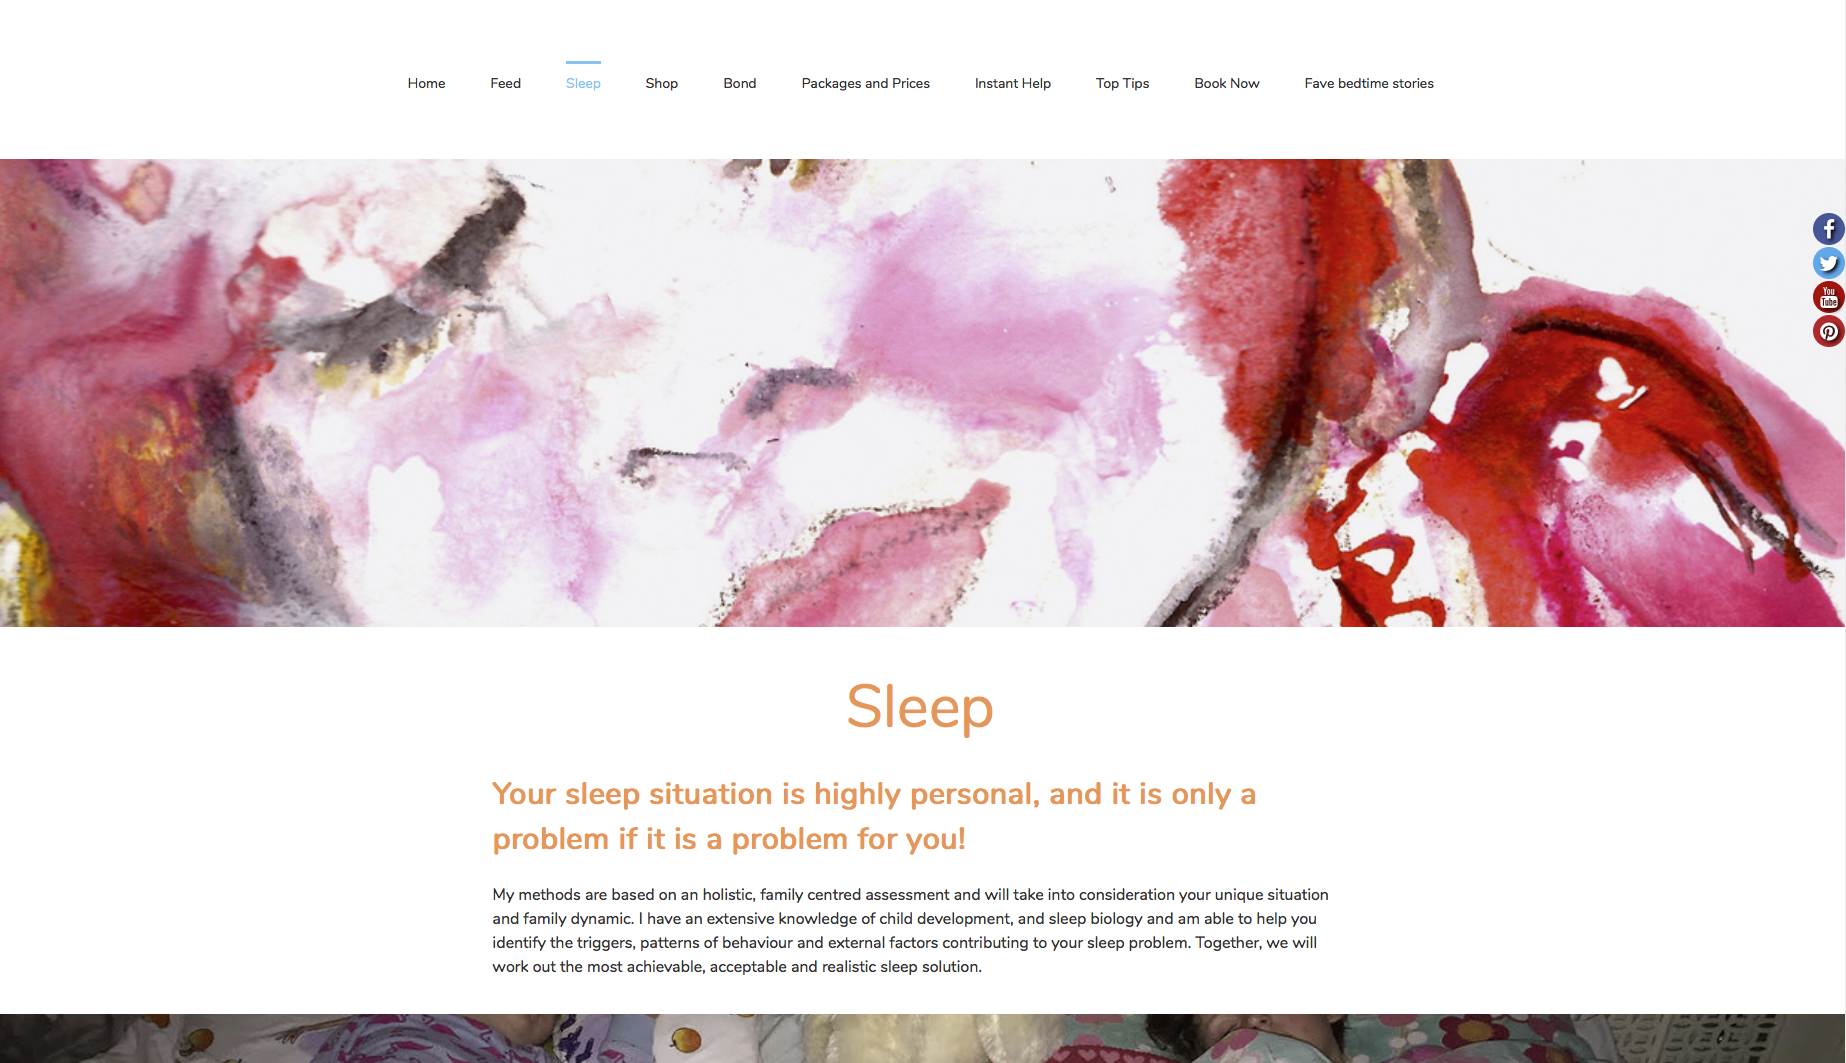 Sleep page from feed sleep bond website